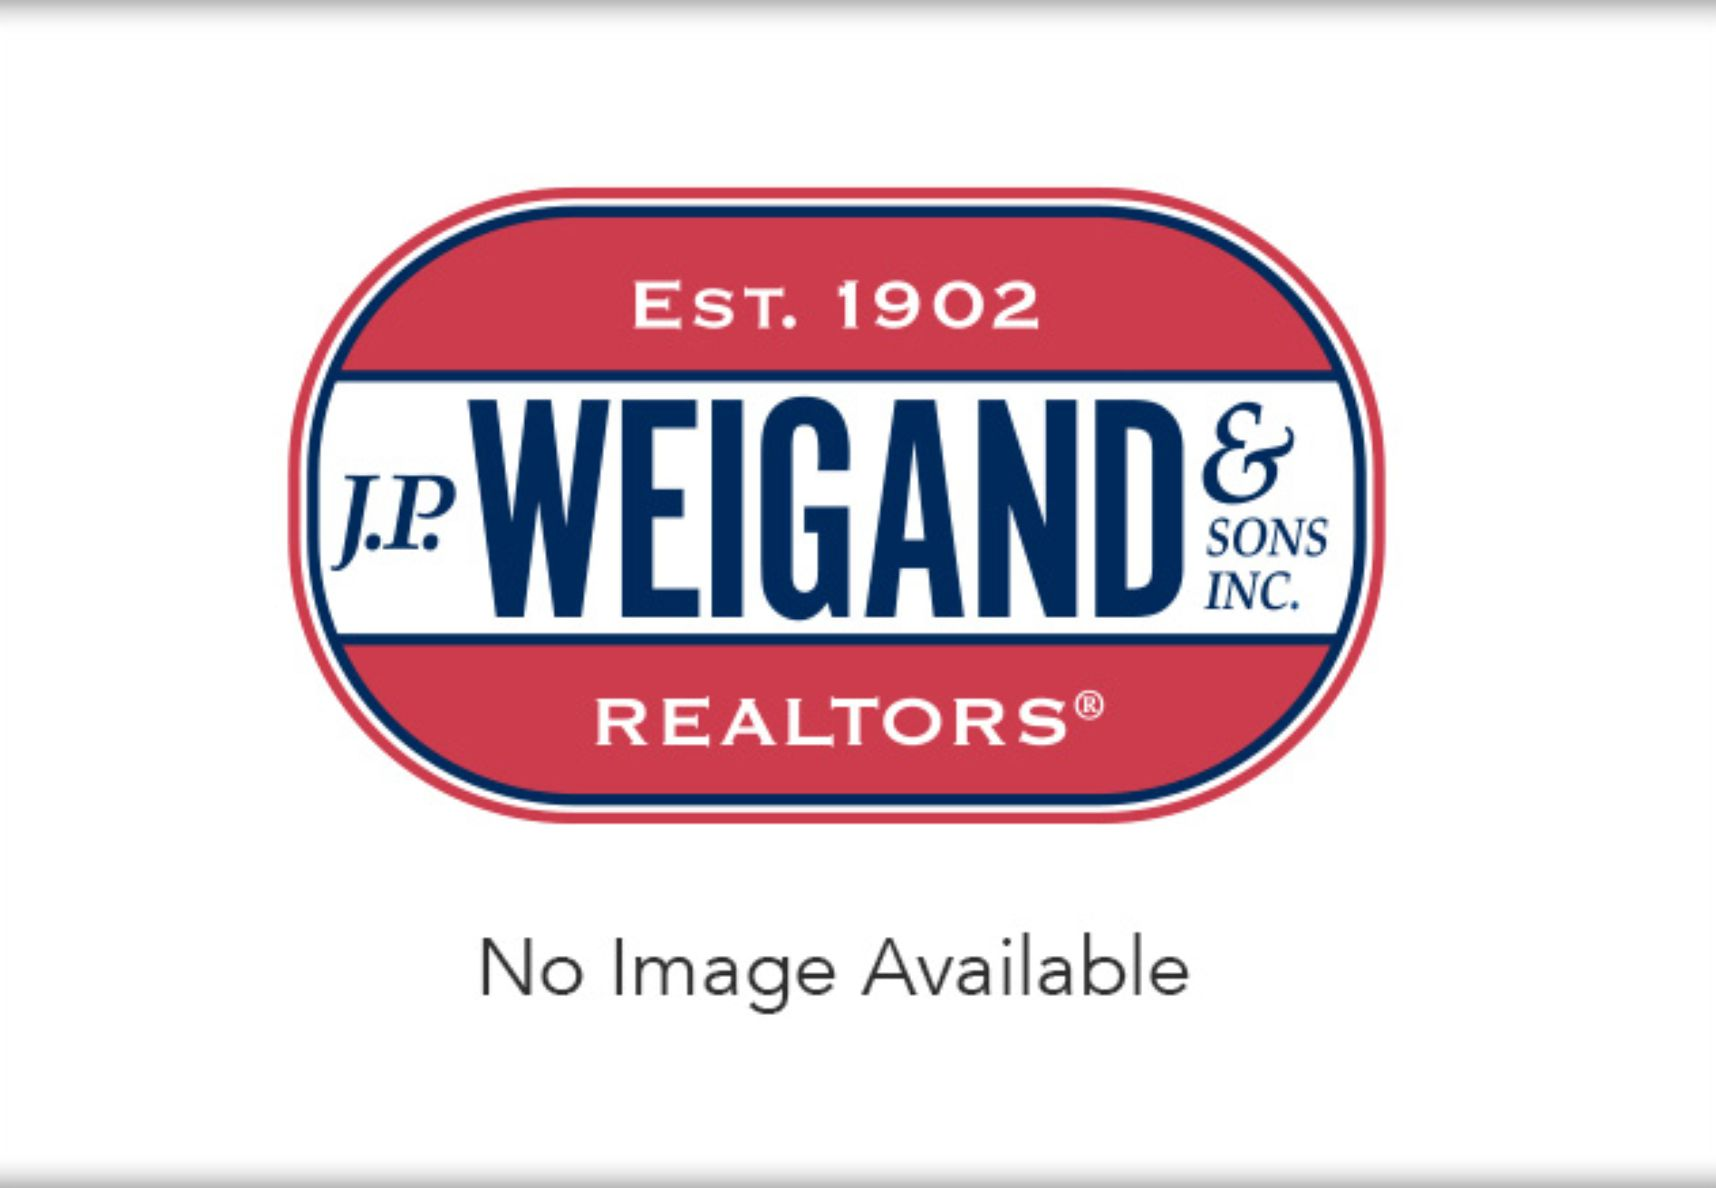 433 N WESTFIELD CT Wichita, KS 67212 - Photo 3